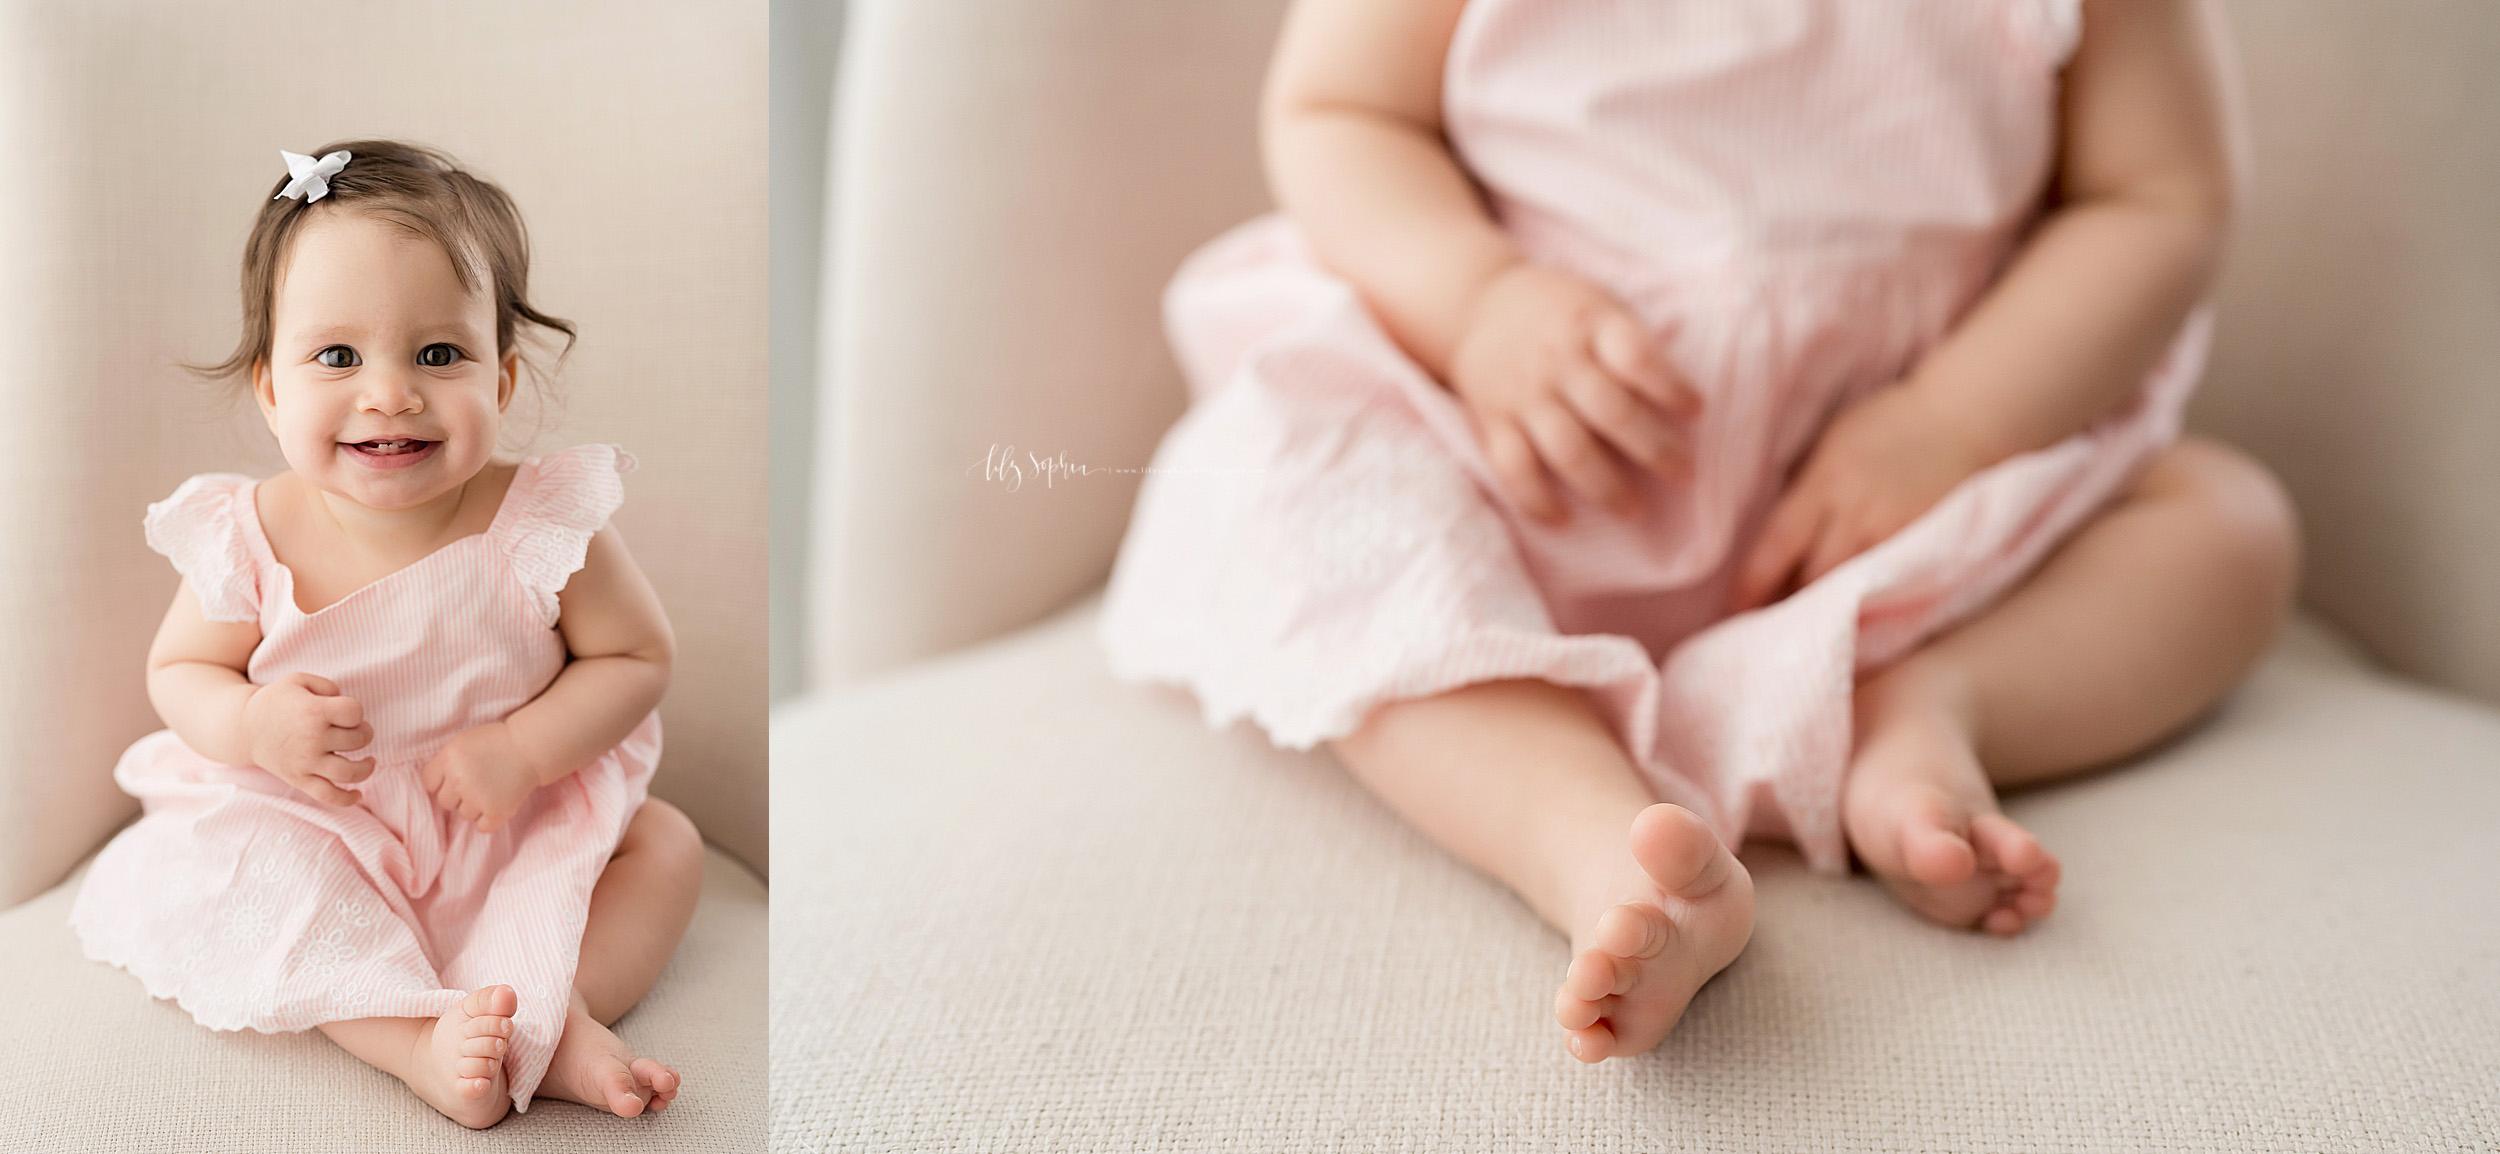 atlanta-decatur-candler-park-sandy-springs-buckhead-virginia-highlands-west-end-decatur-lily-sophia-photography-baby-girl-nine-month-milestone-family-photos-grandma-parents-peachtree-hills_2298.jpg